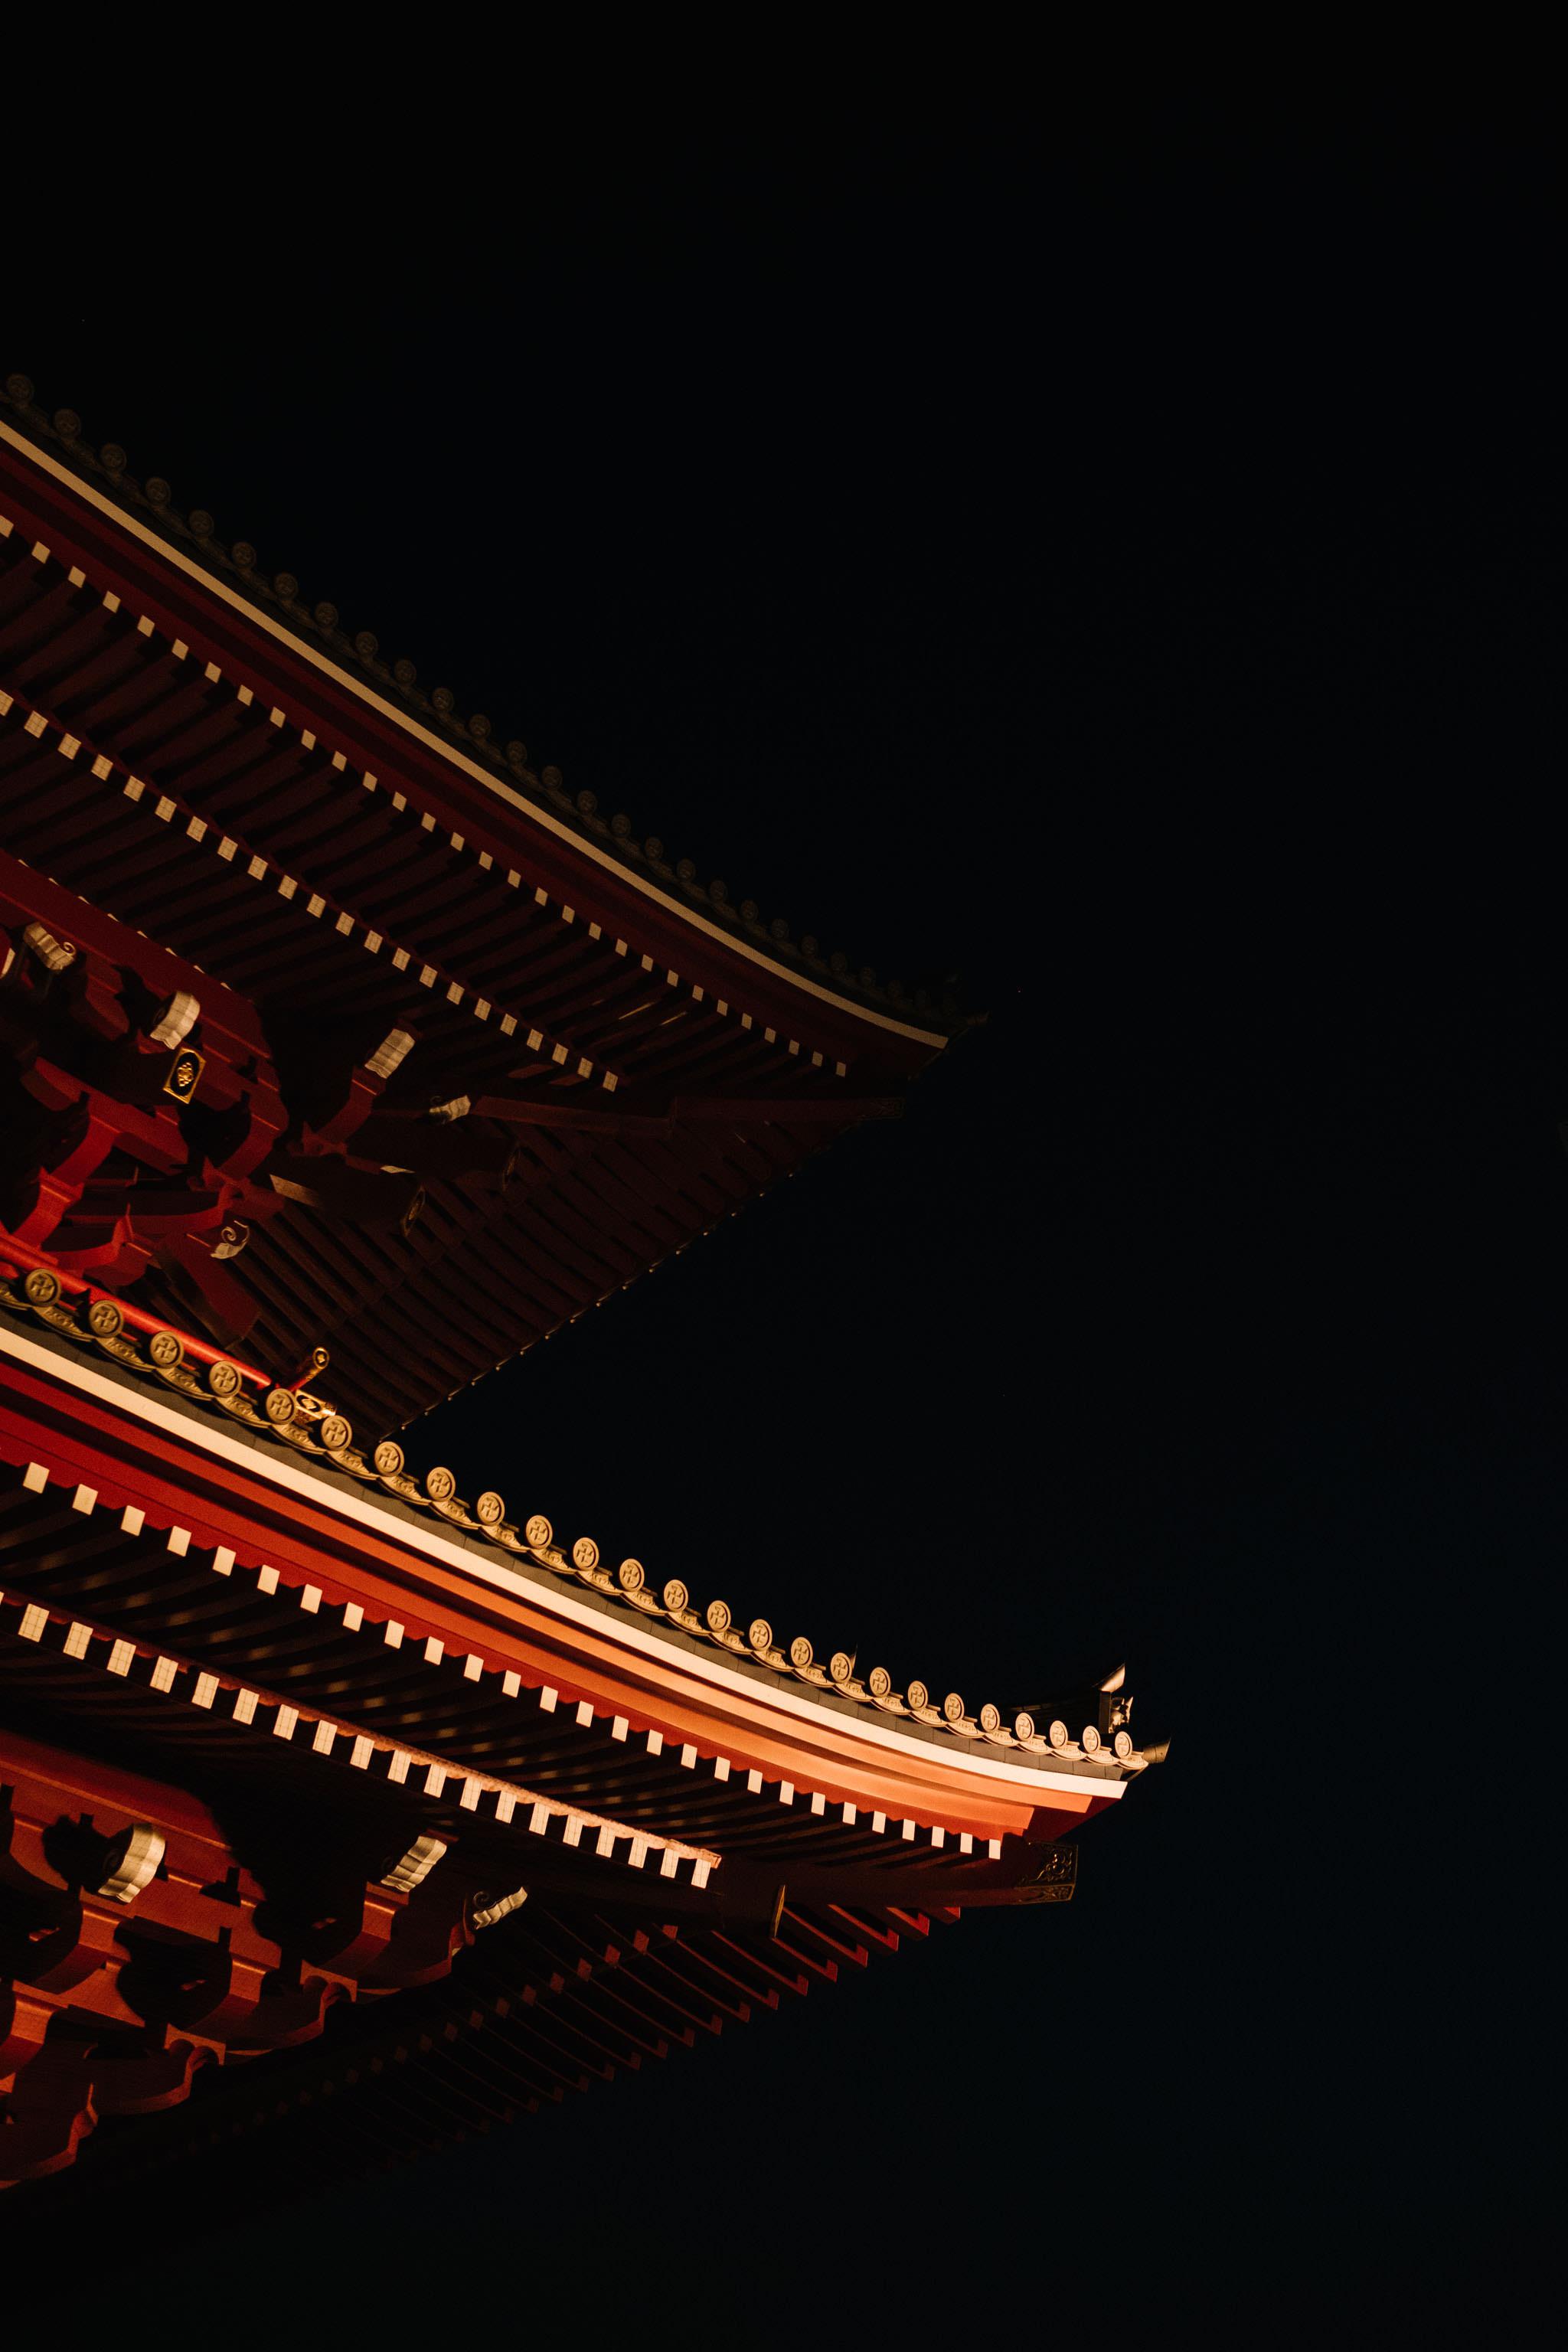 chris_eberhardt_japan_travel_reise_nippon-6.jpg